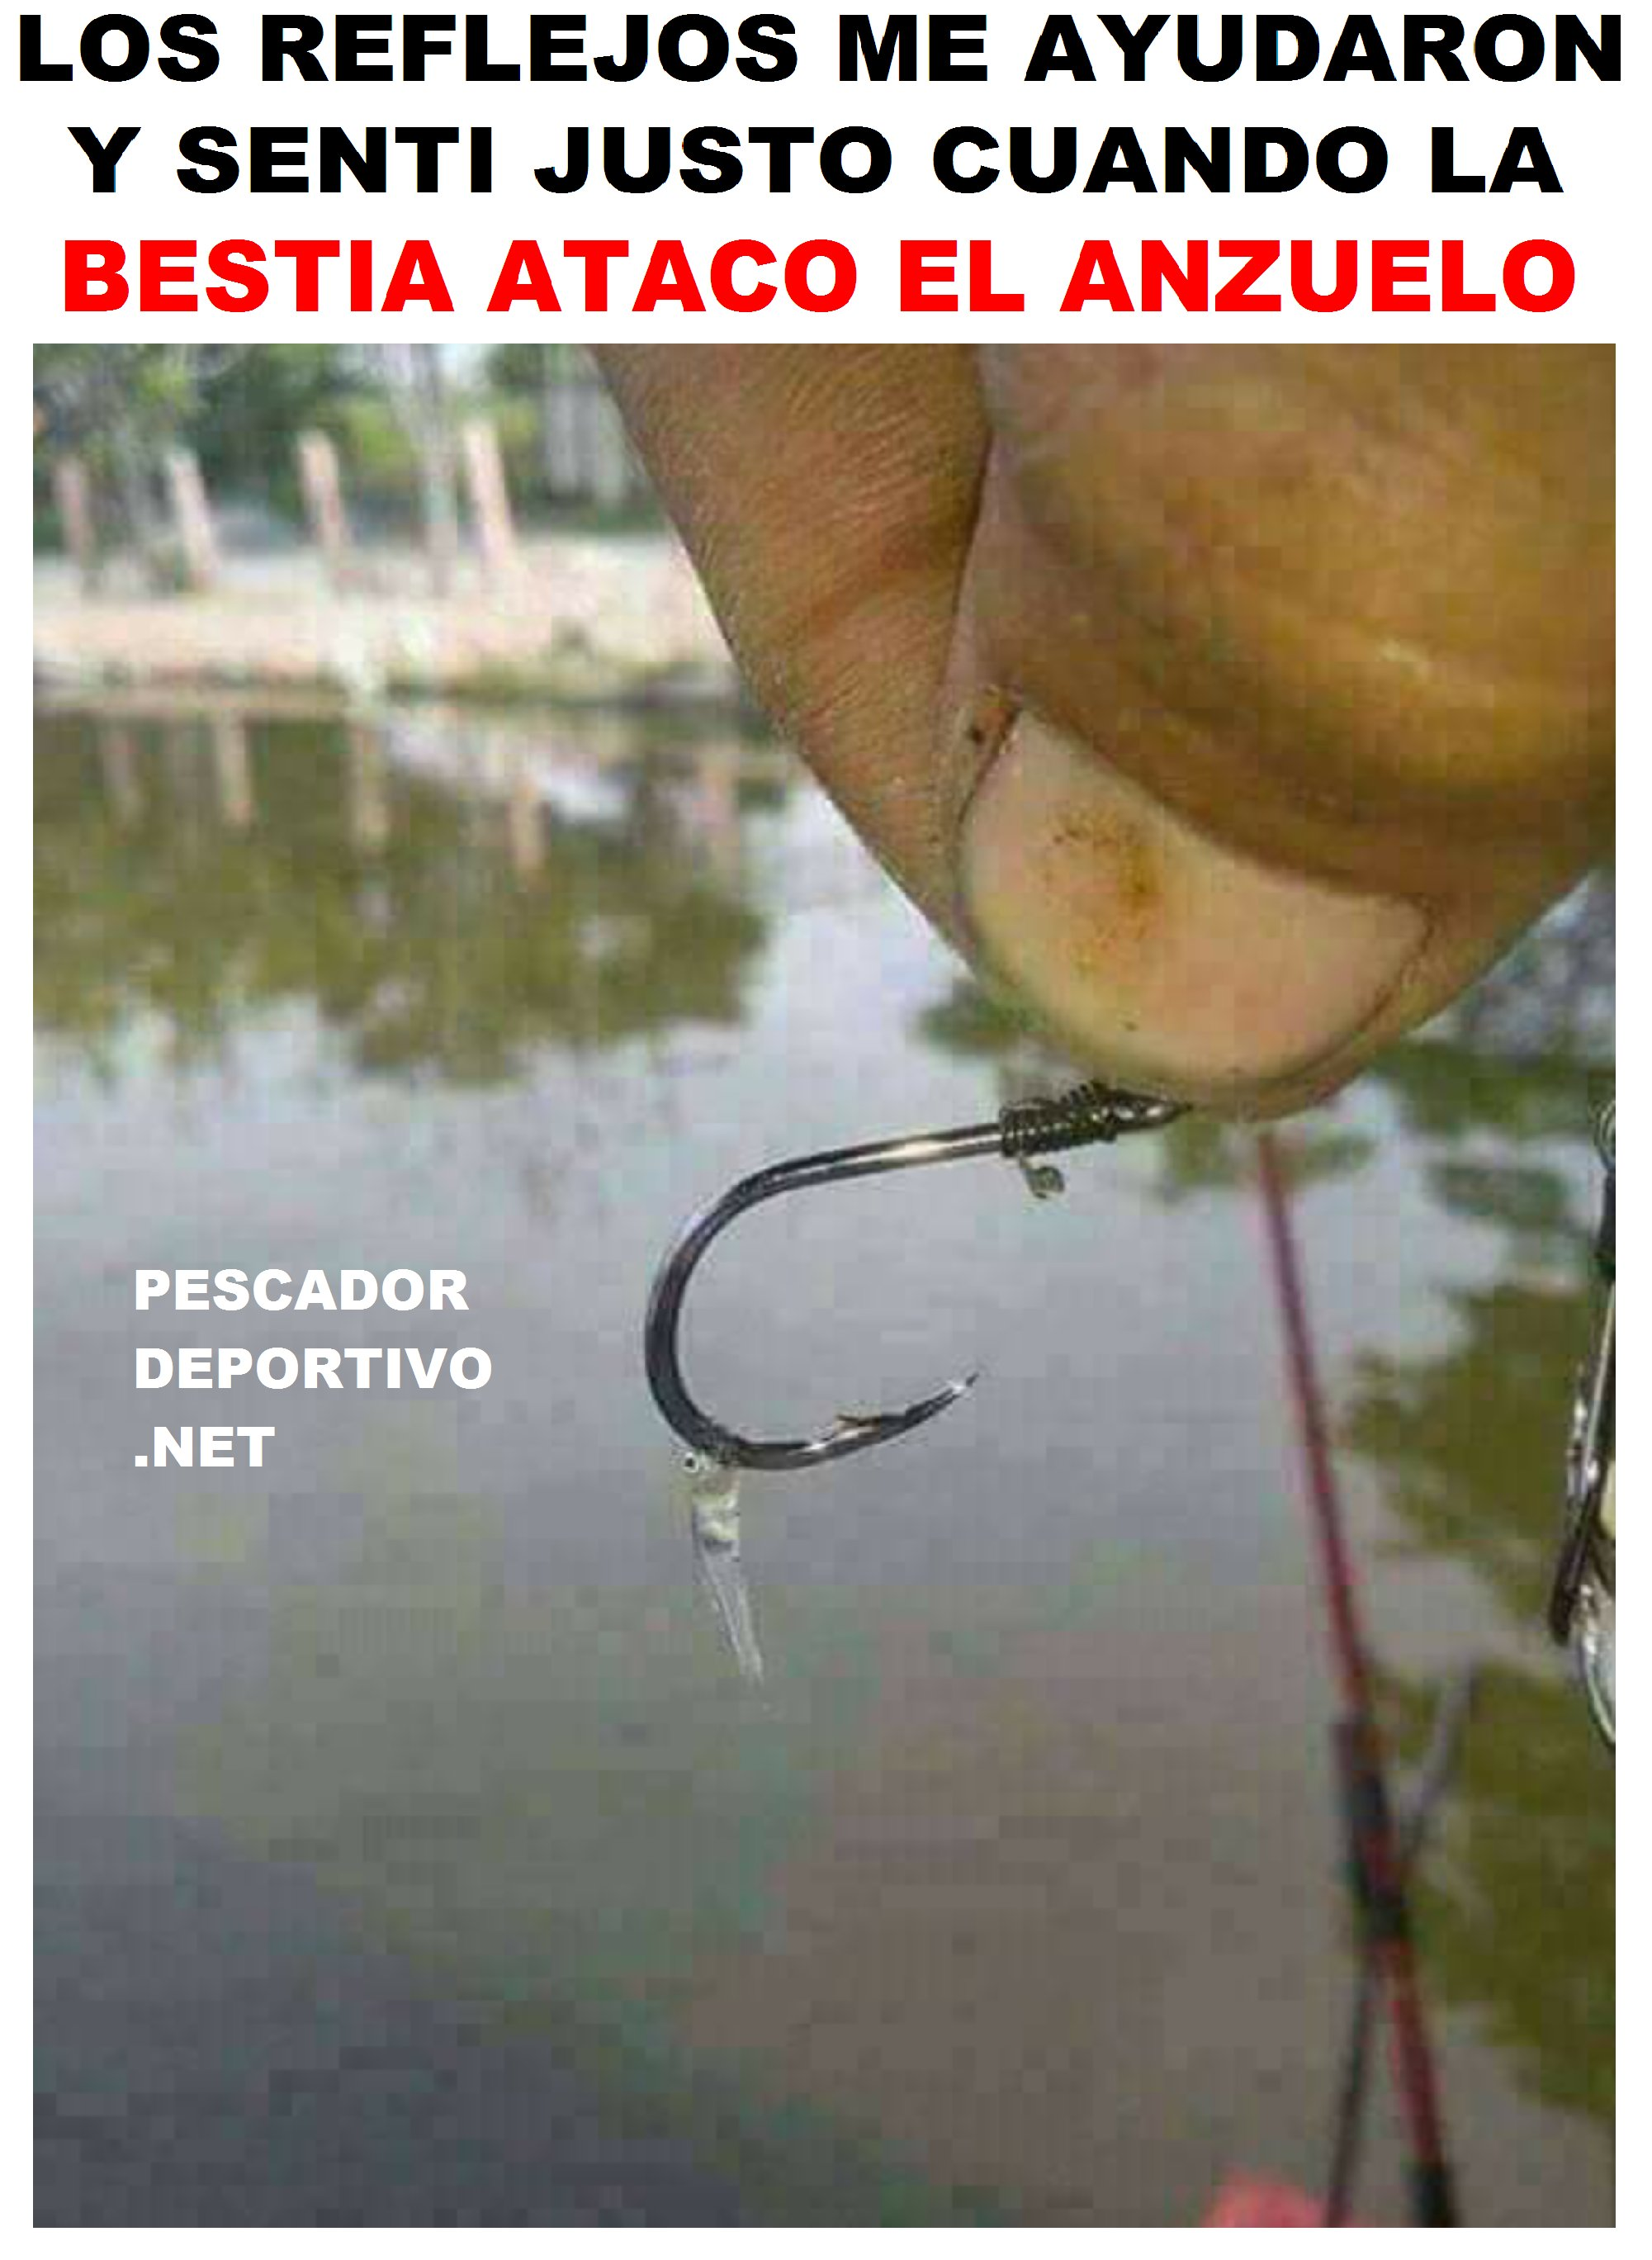 reflejos pesca2313020367876845535..png